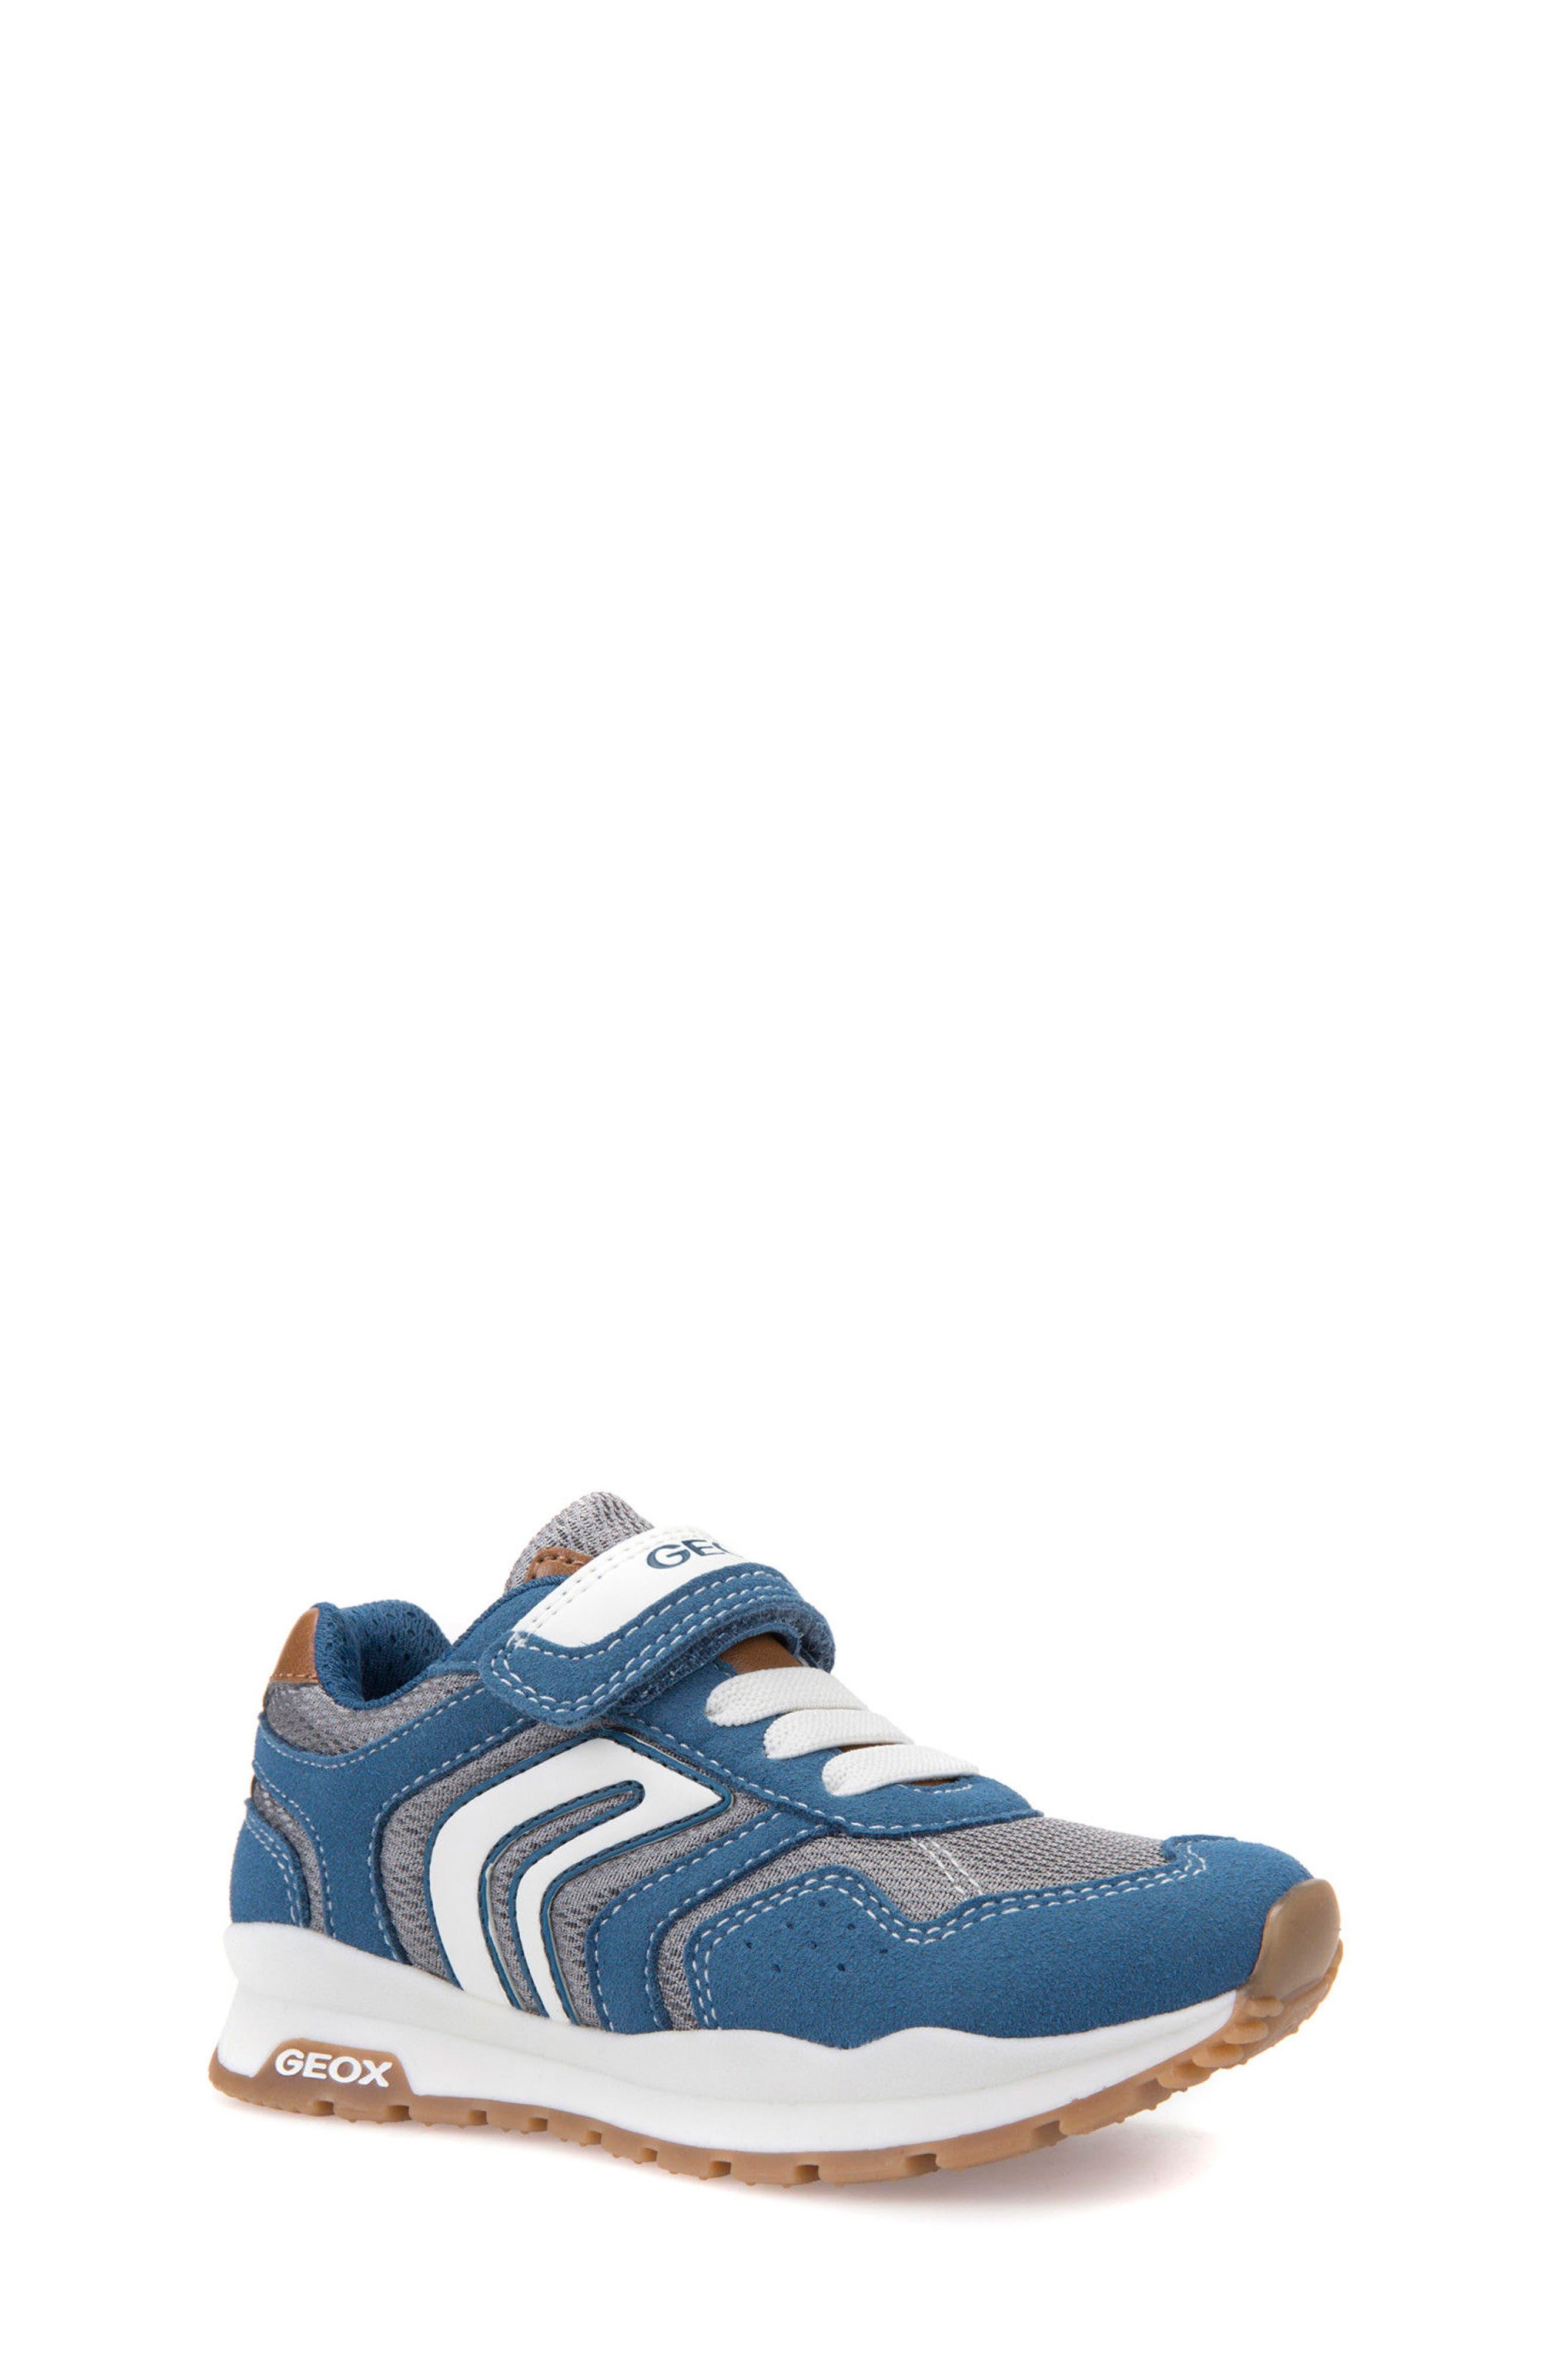 Boys Geox Pavel Low Top Sneaker Size 65US  40EU  Blue